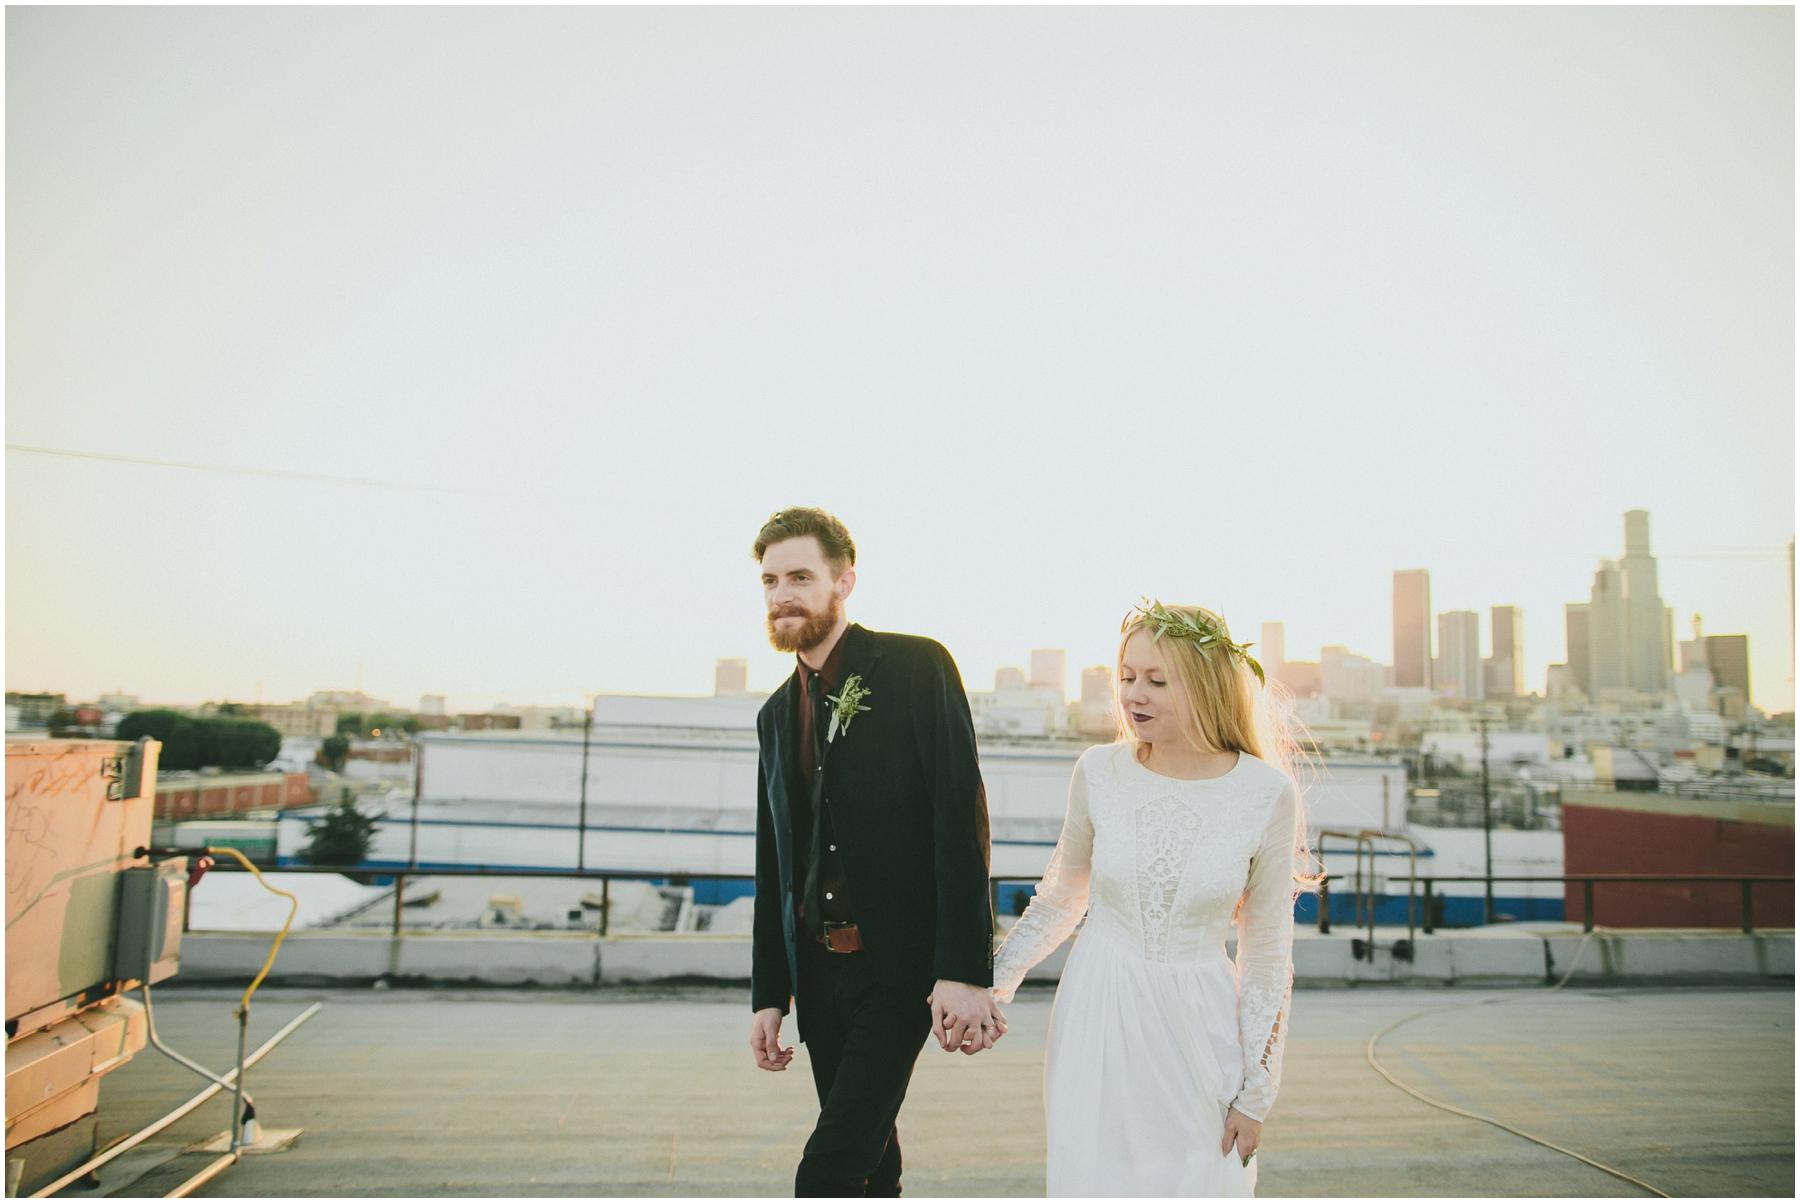 Natalie+Corey-WEDDING_KELLYBOITANO_0114